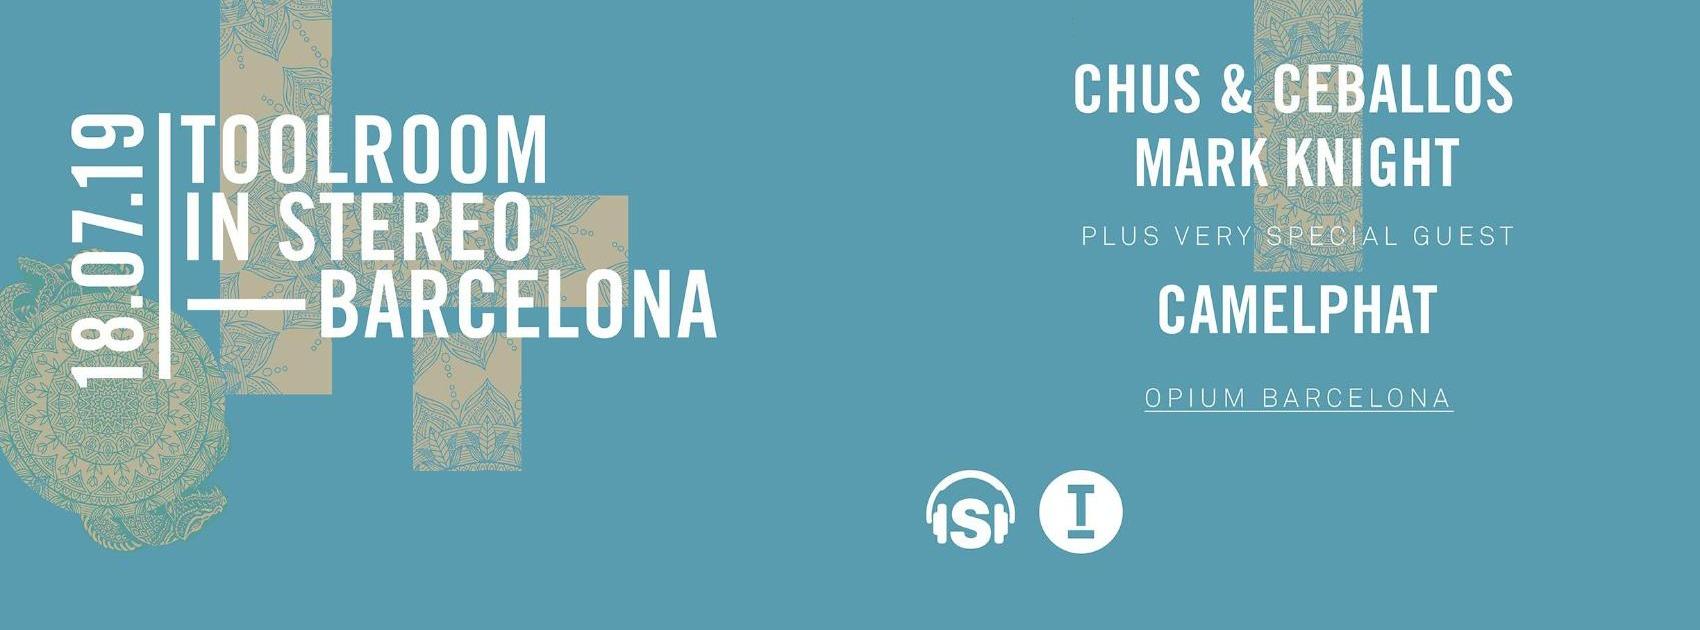 TOOLROOM IN STEREO - Club Opium Barcelona